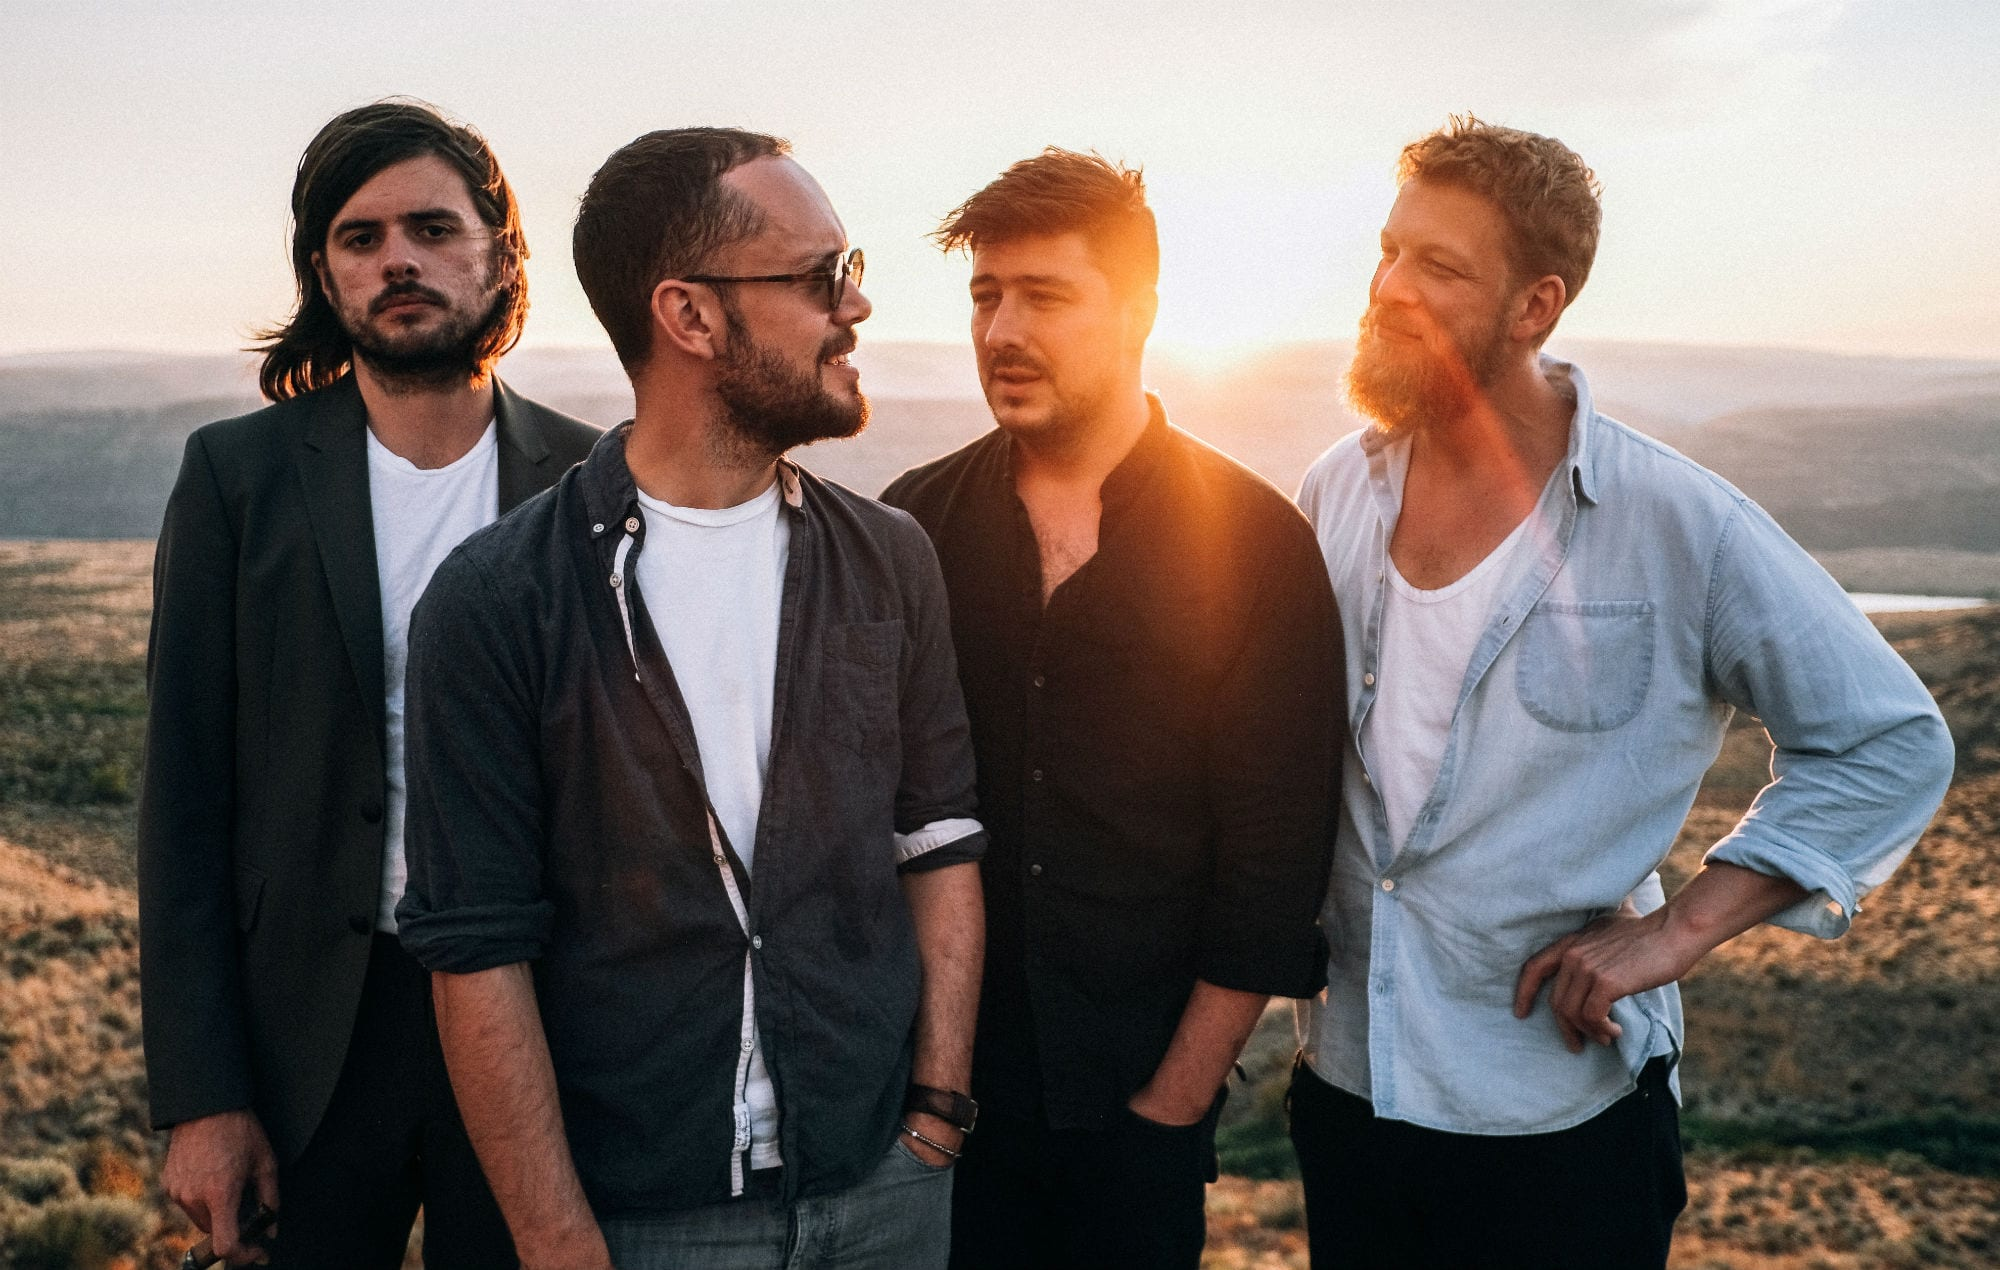 Music band Mumford and Sons